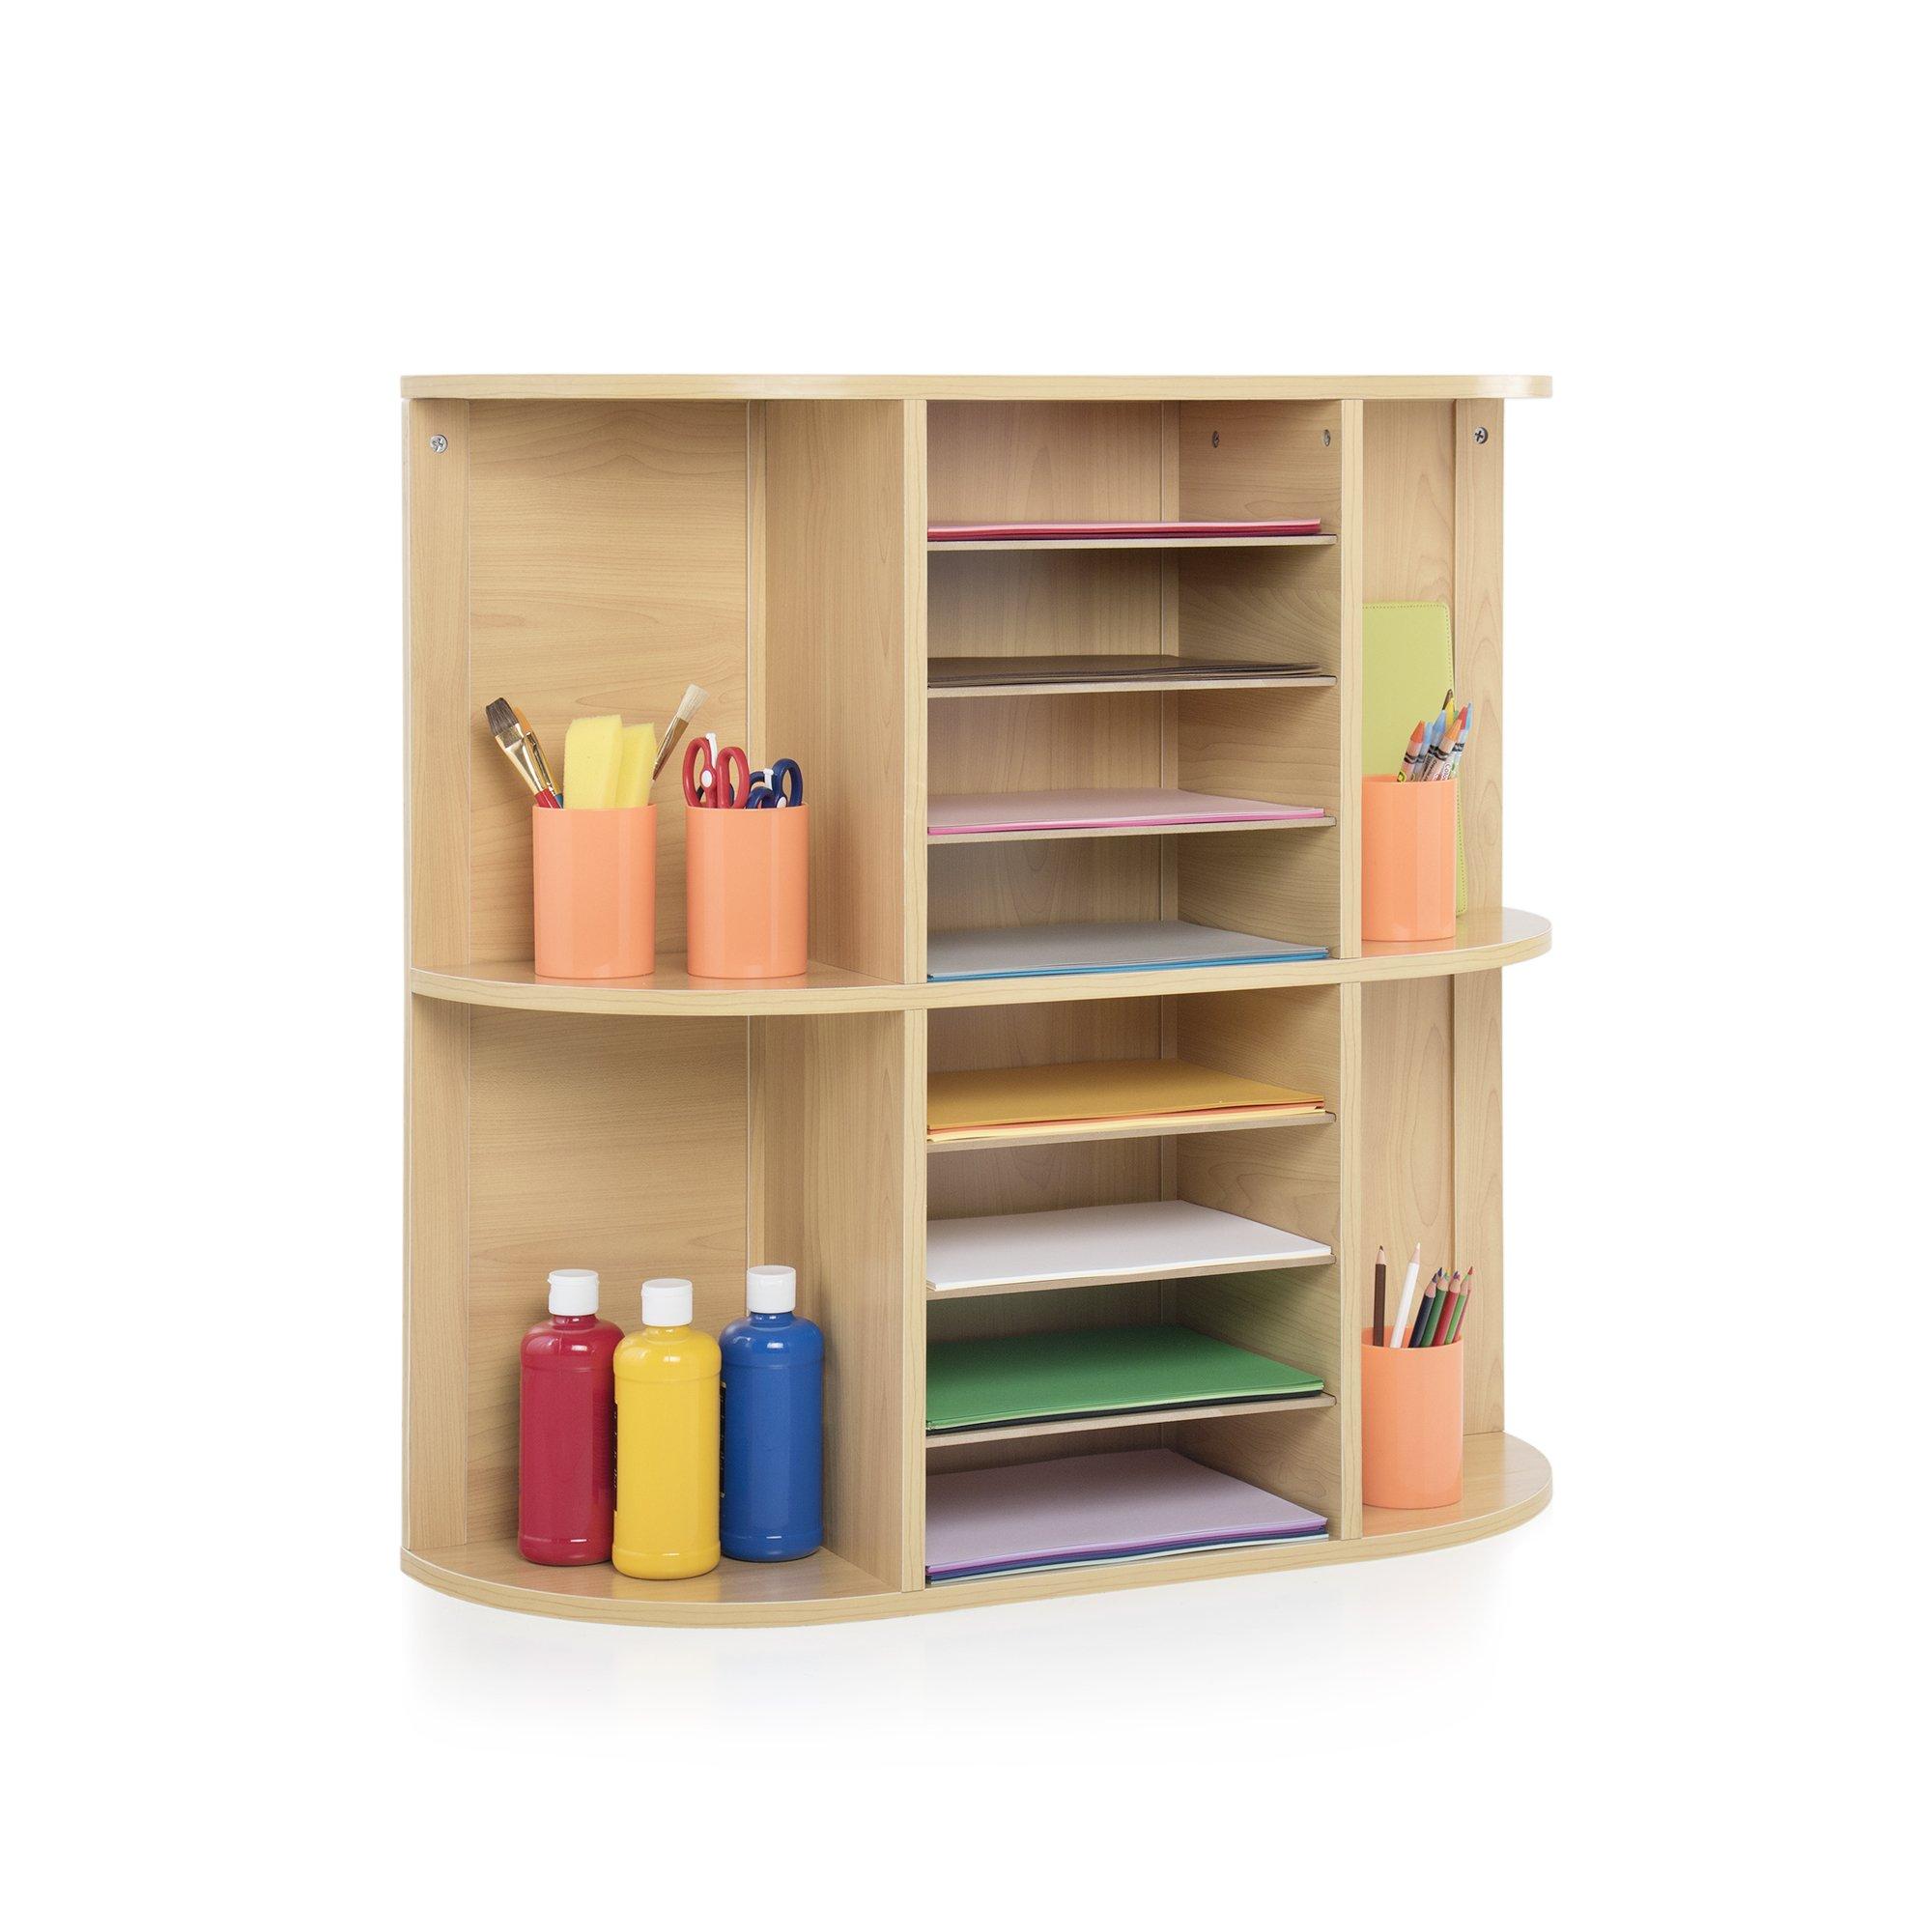 Guidecraft Display and Storage Center, School Supply Book and Award Organizer Shelves, Kids Furniture